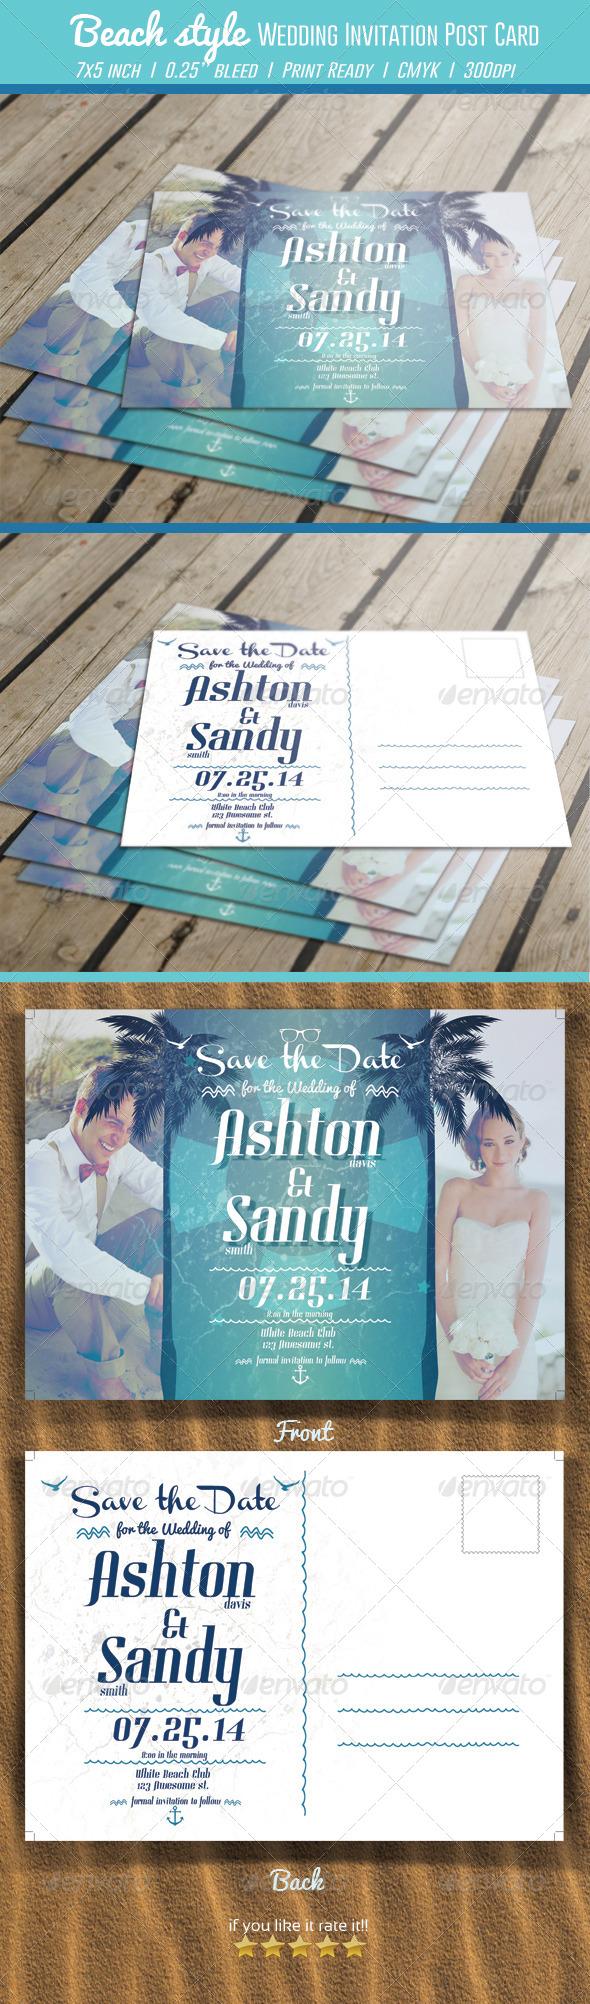 GraphicRiver Beach Style Wedding Invitation Post Card 7035108